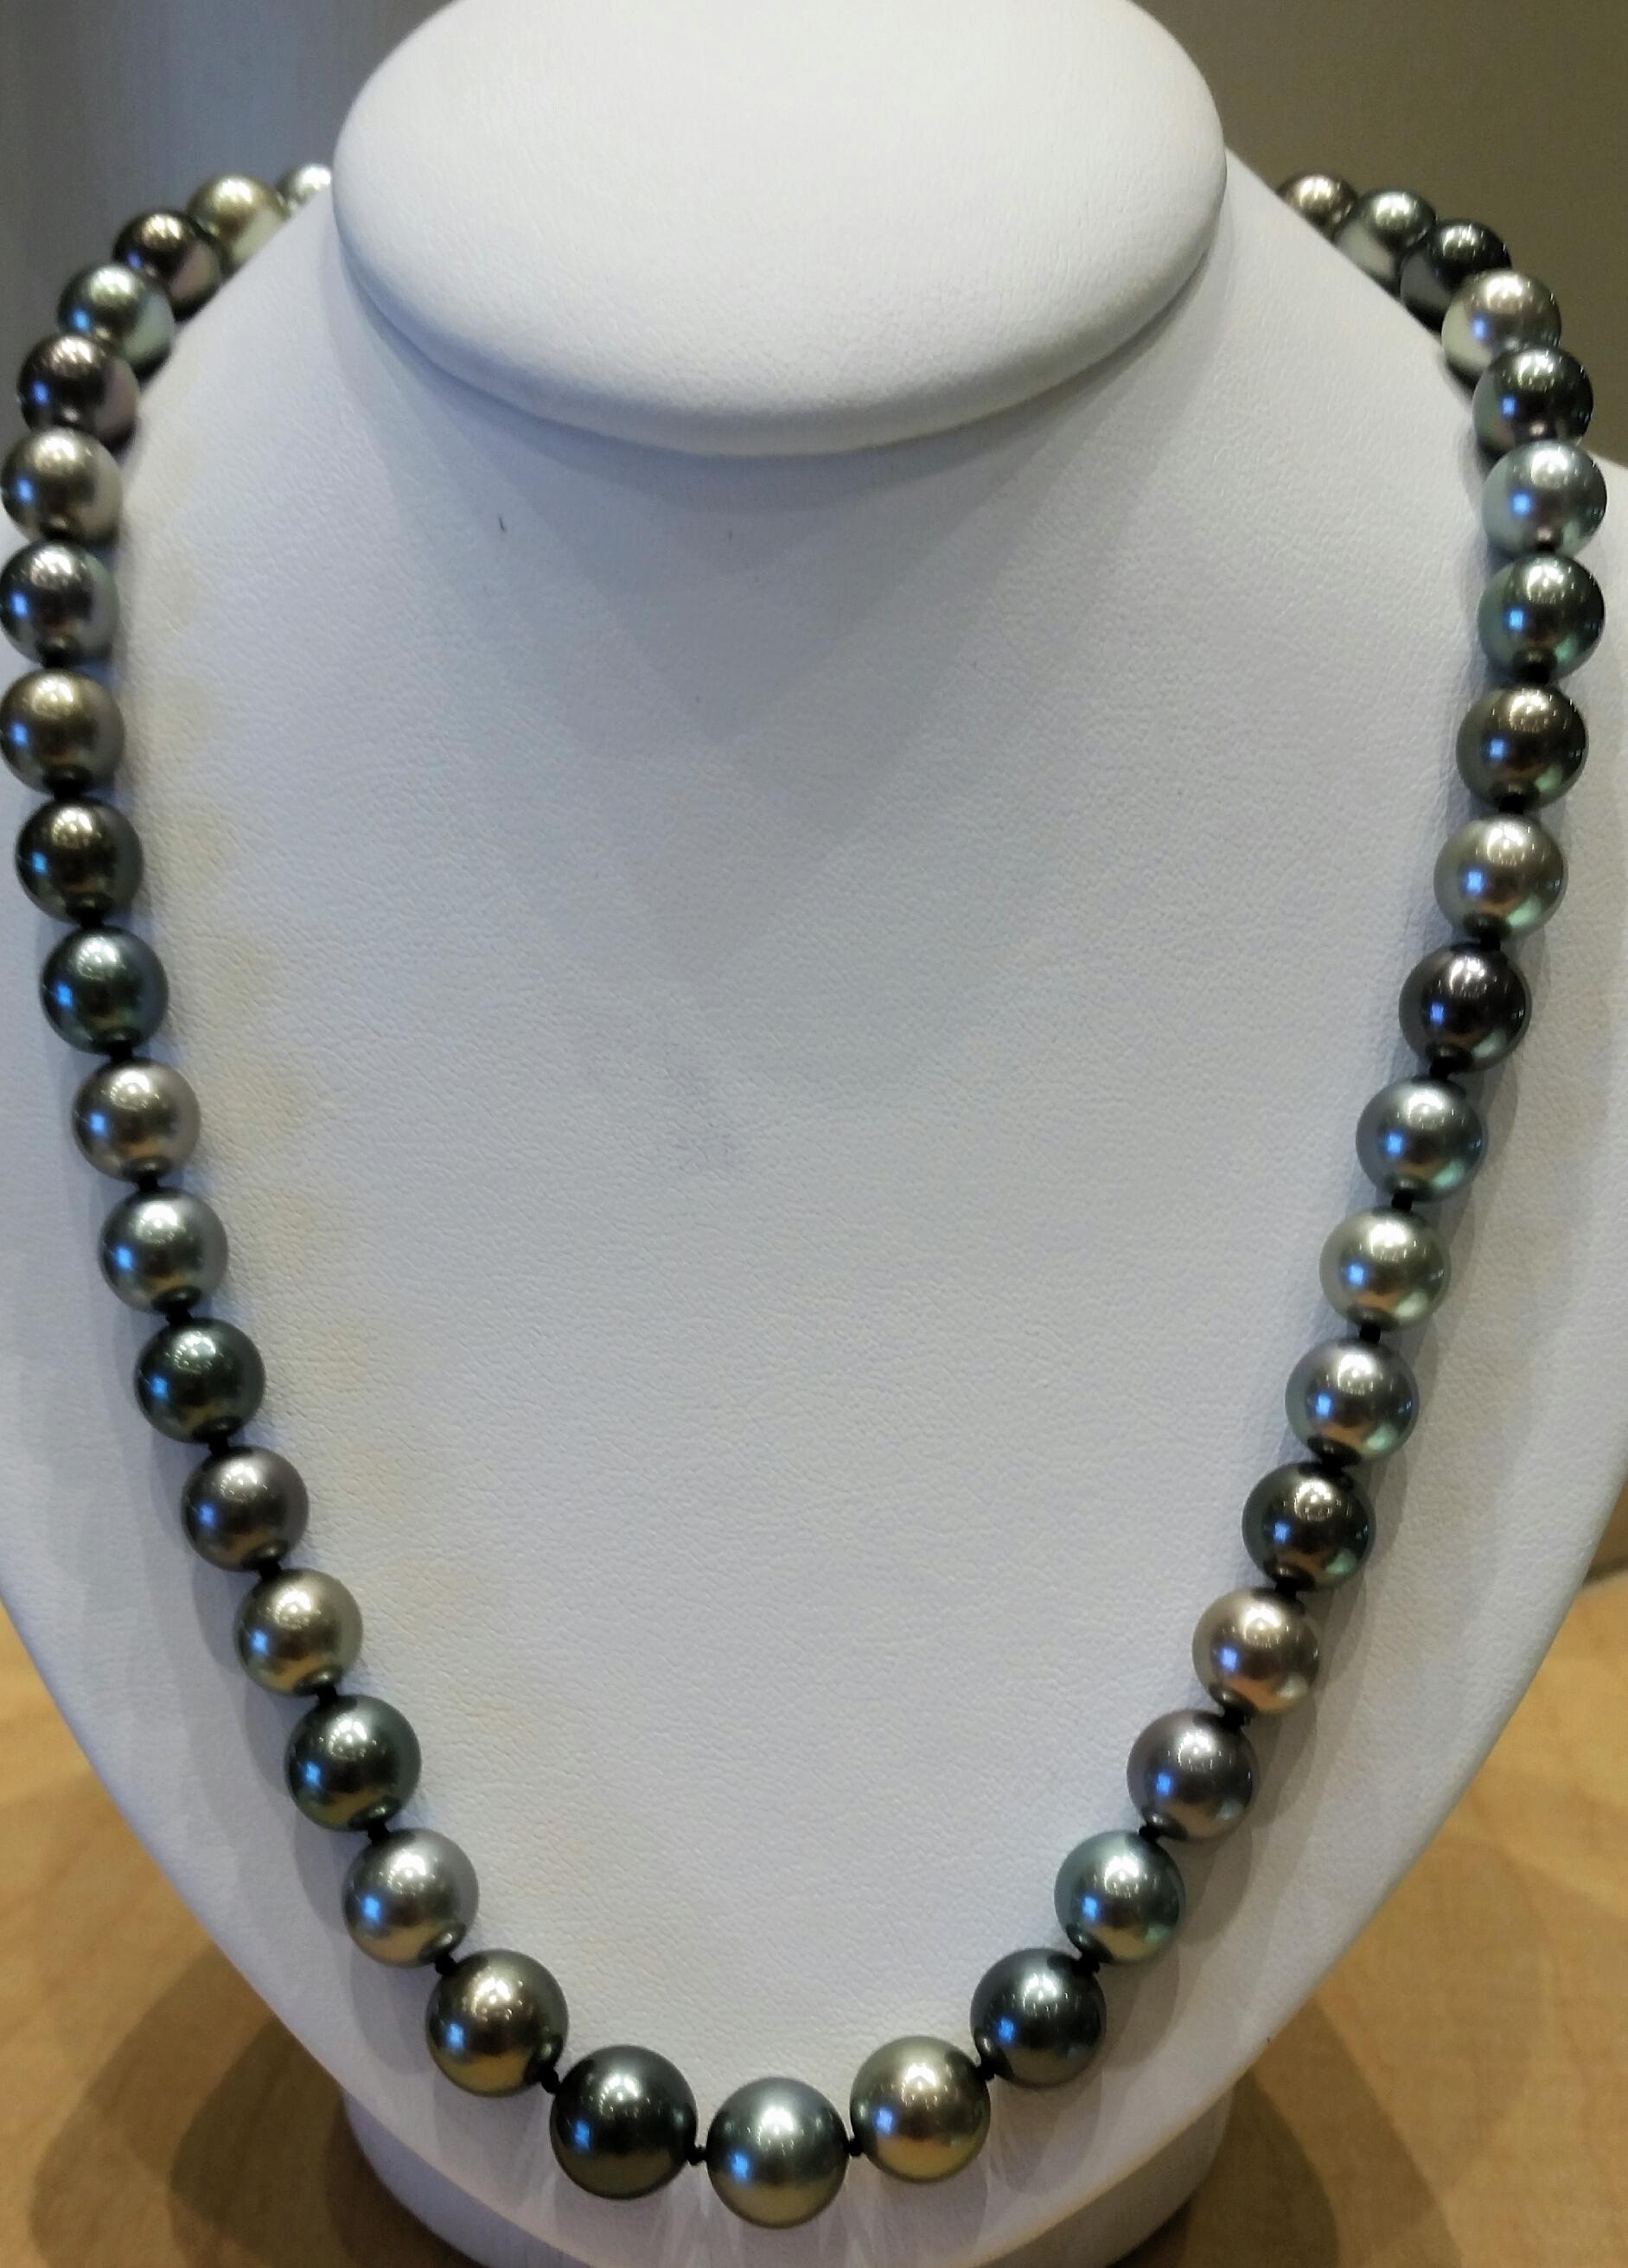 8-10mm Round Black and Gray Tahitian Pearl Strand